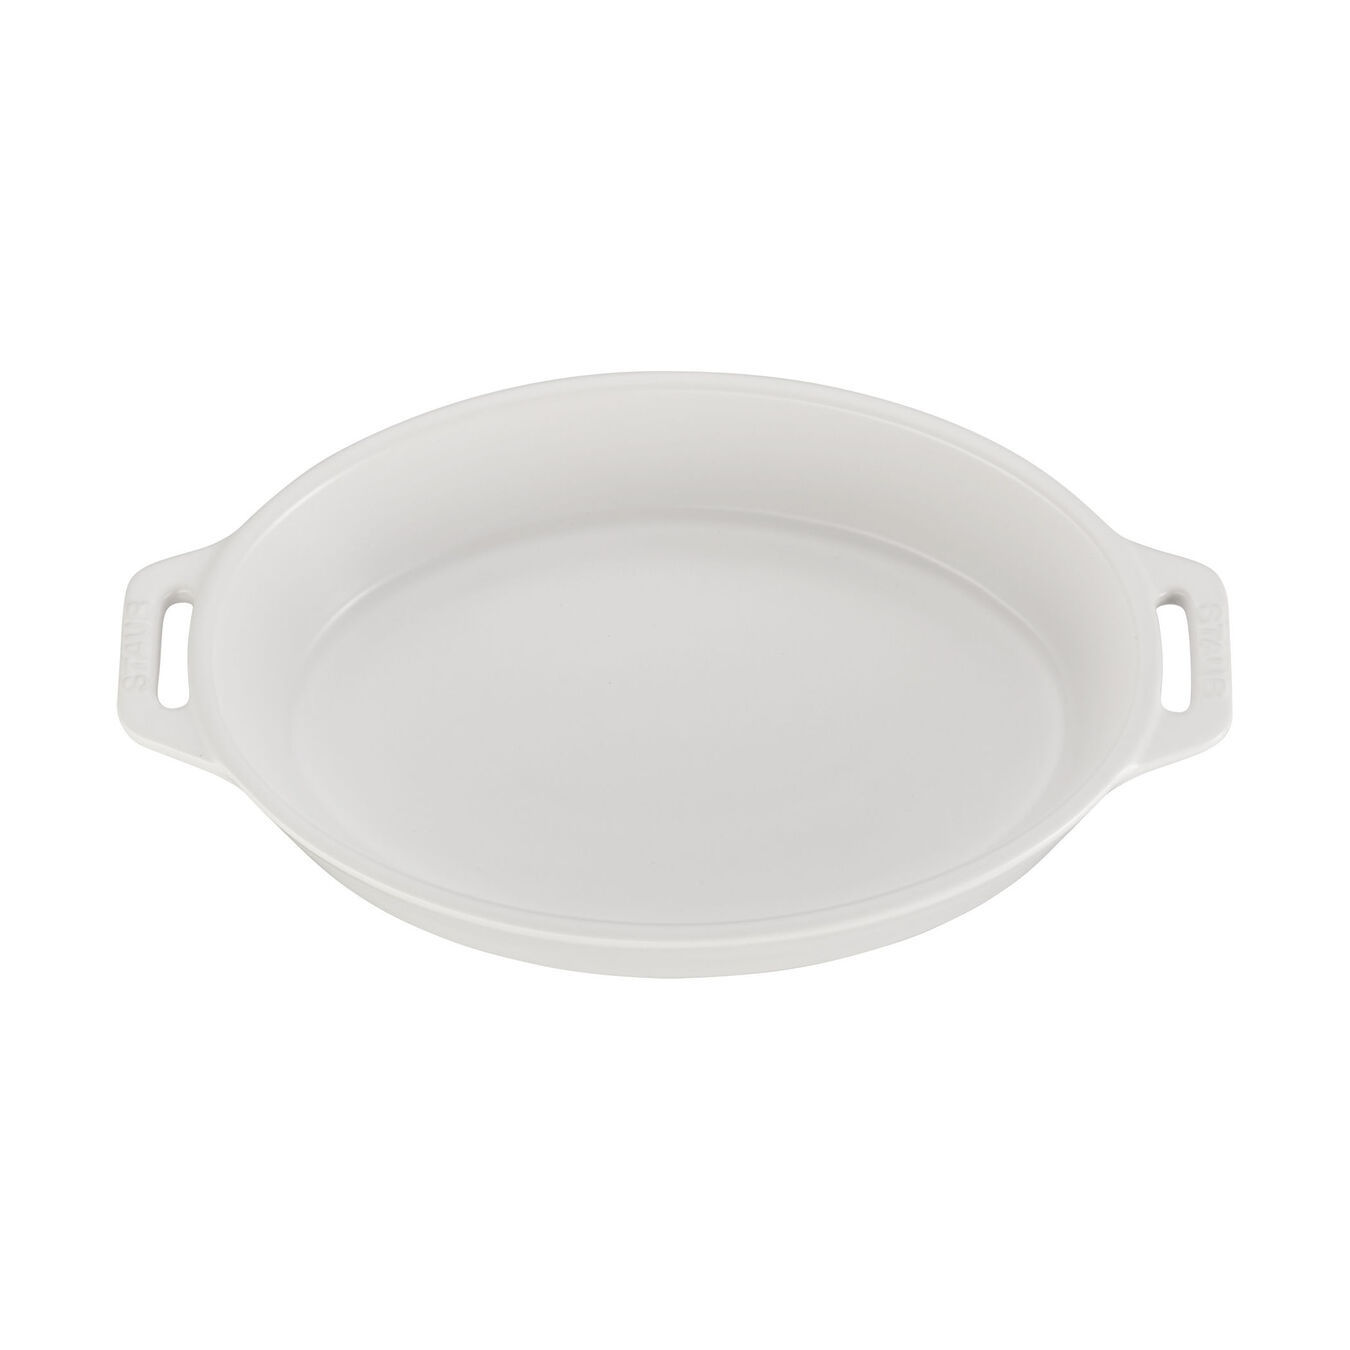 Ceramic oval Oven dish, matte-white,,large 2